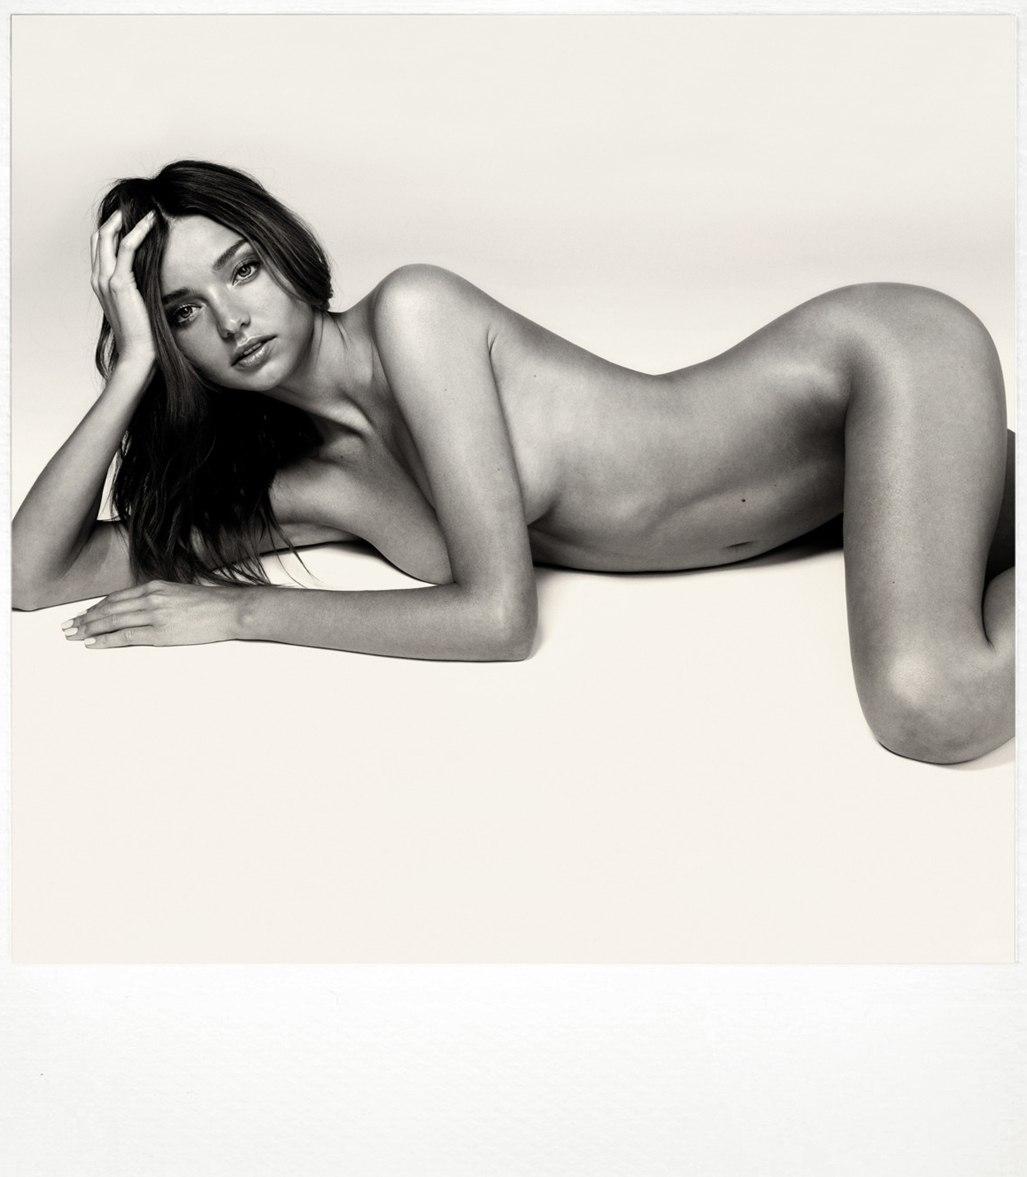 Miranda Kerr / Миранда Керр, фотограф Chris Colls